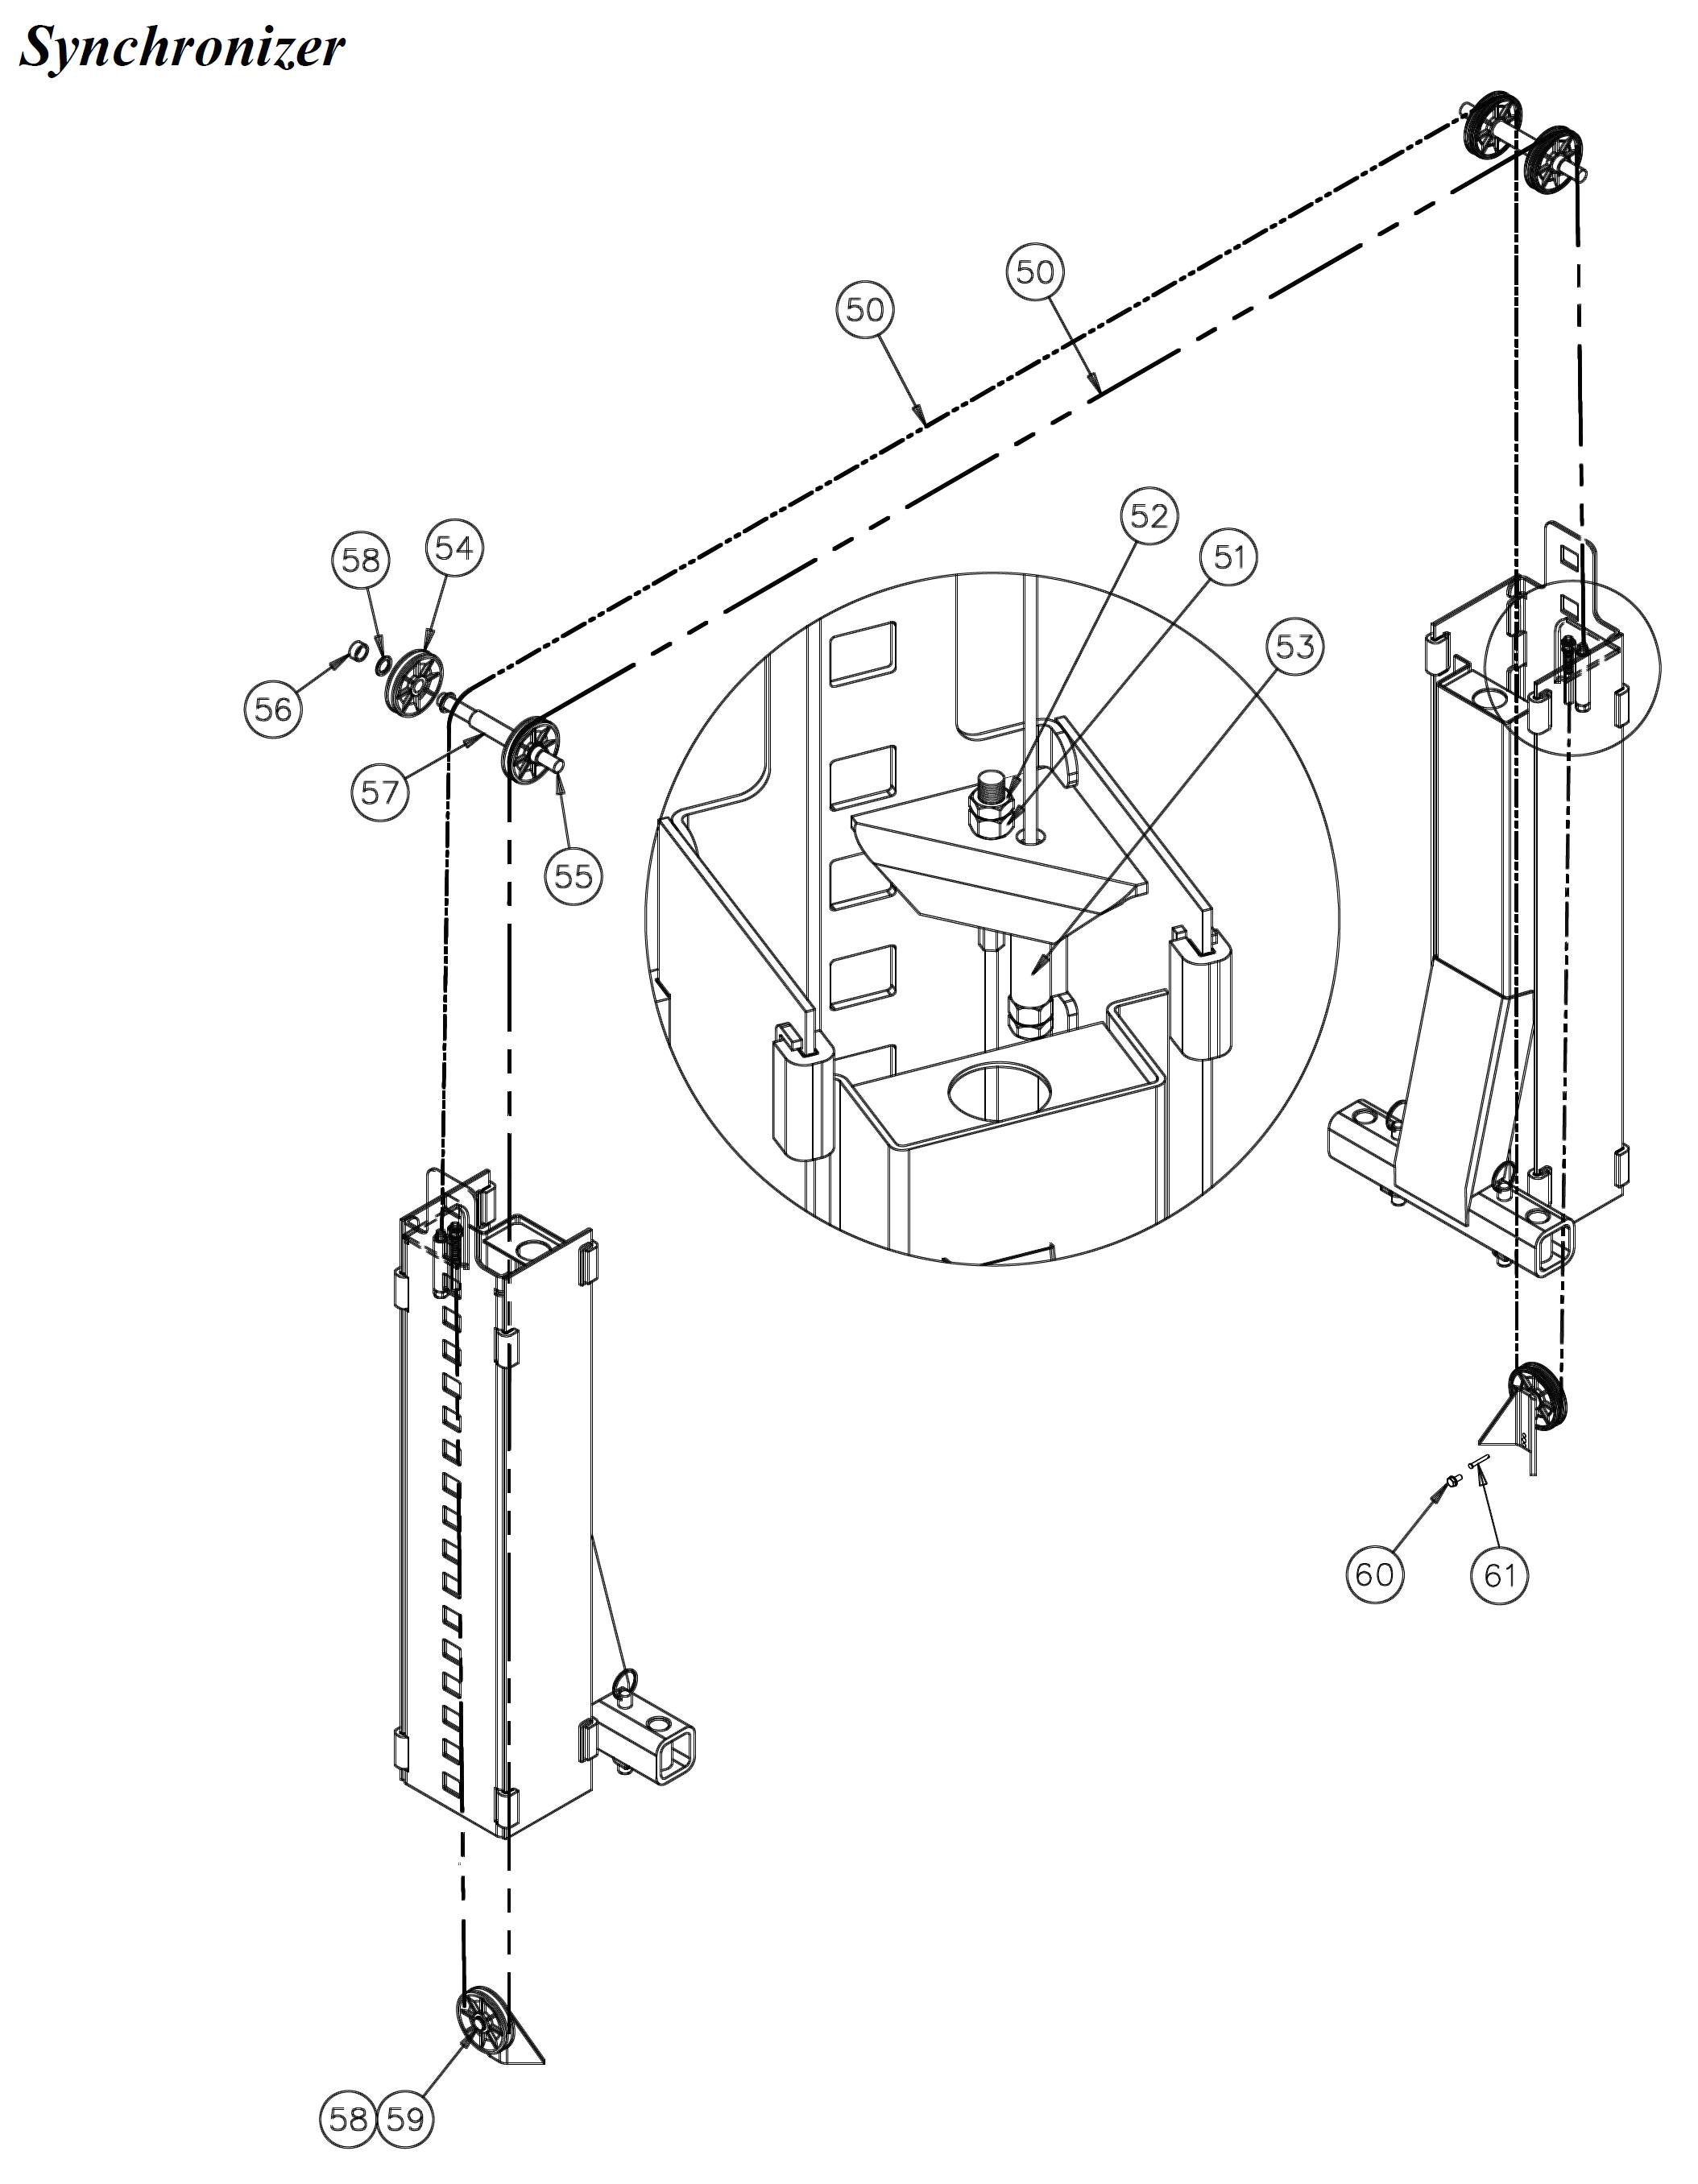 cl10-synchronizer-diagram.png